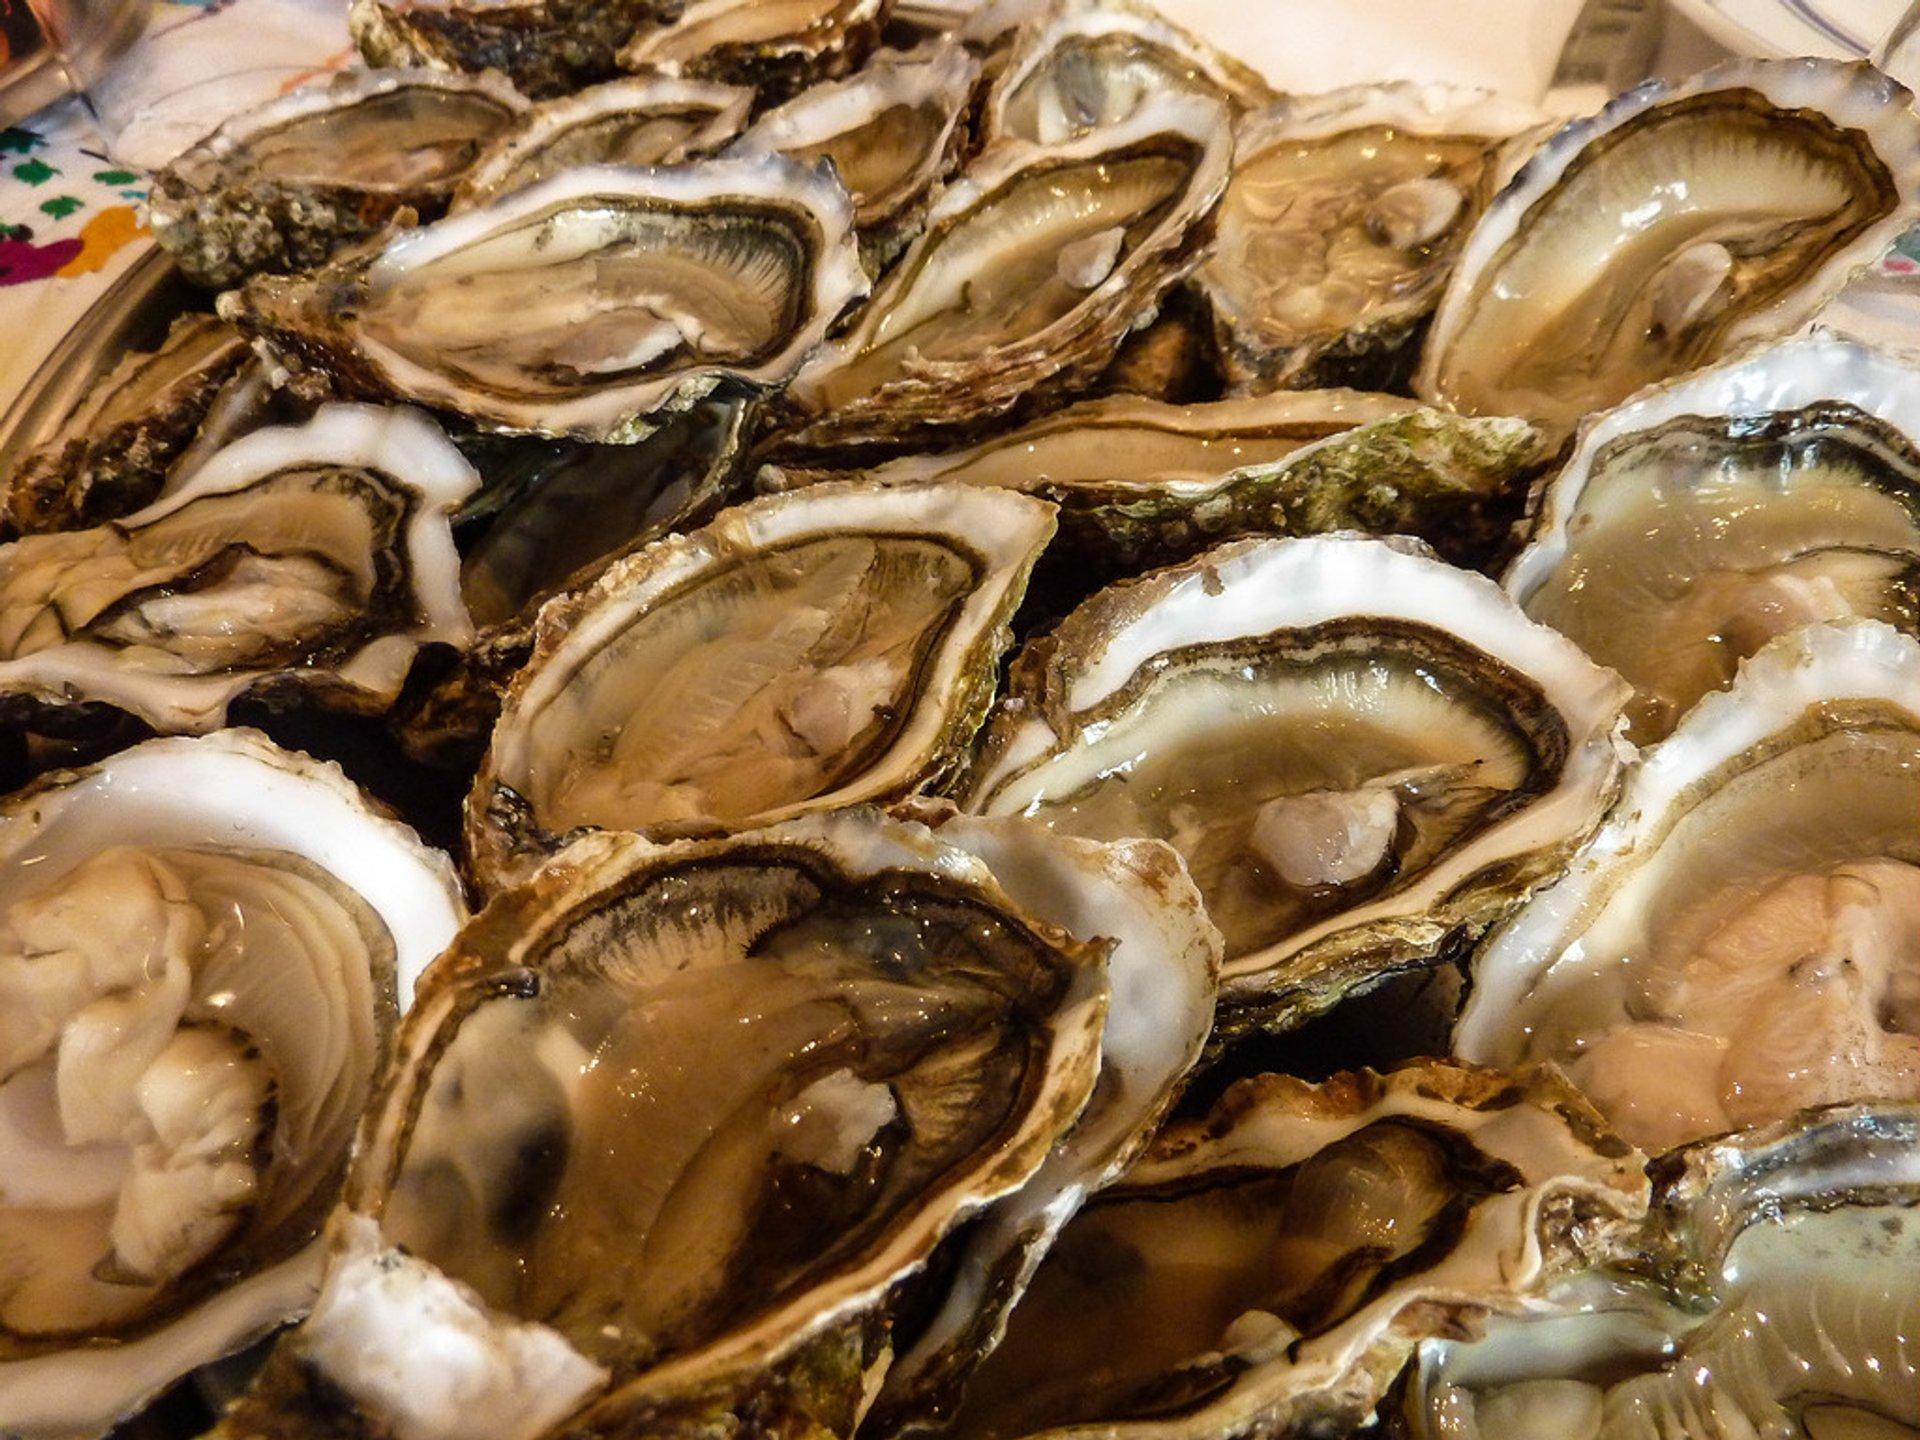 Oyster Safari in the Wadden Sea in Denmark - Best Season 2019